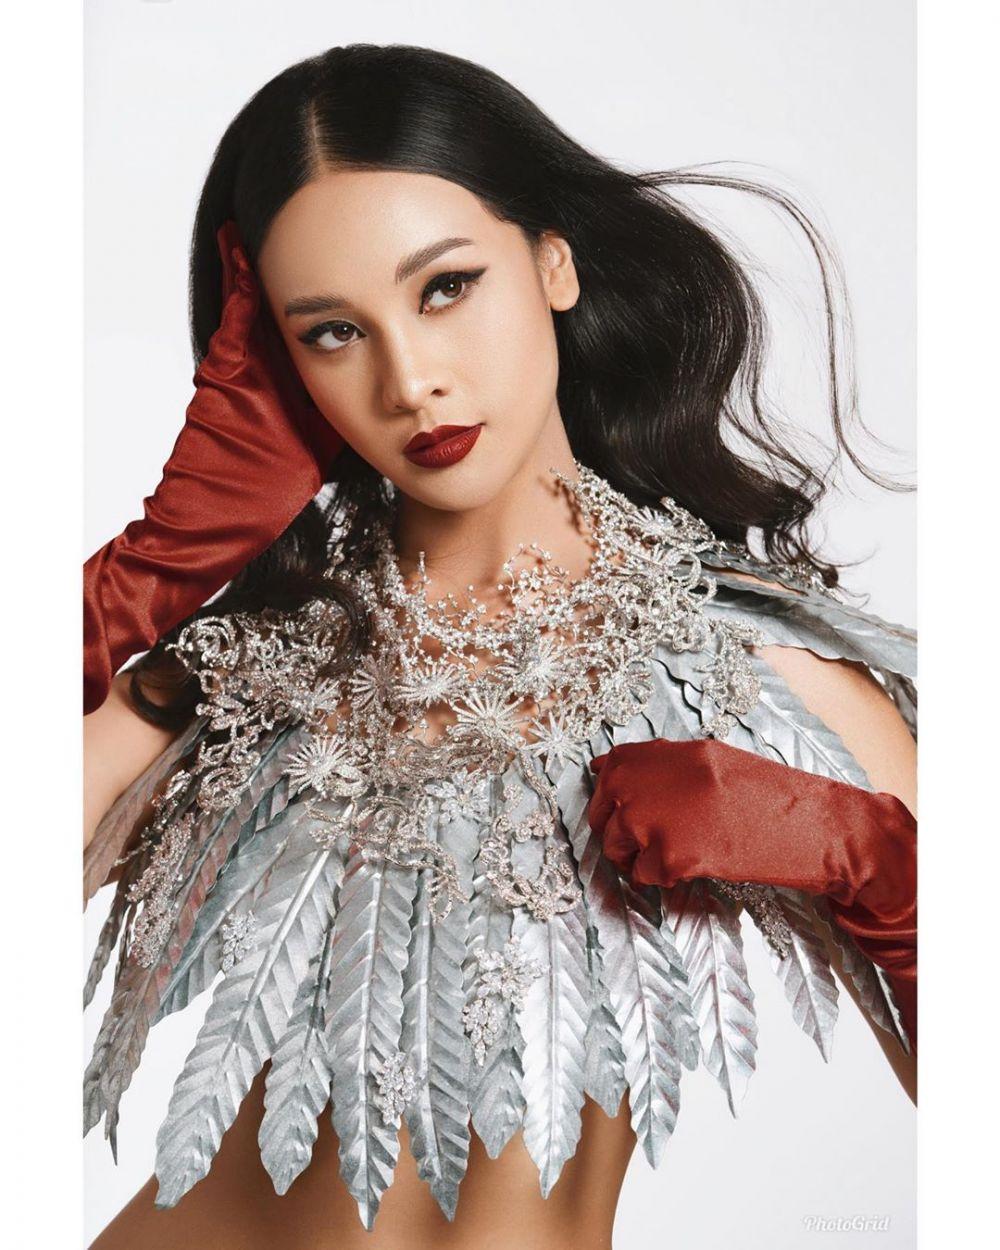 9 Potret Anya Geraldine dengan Lipstik Merah, Pesonanya Bikin Oleng!